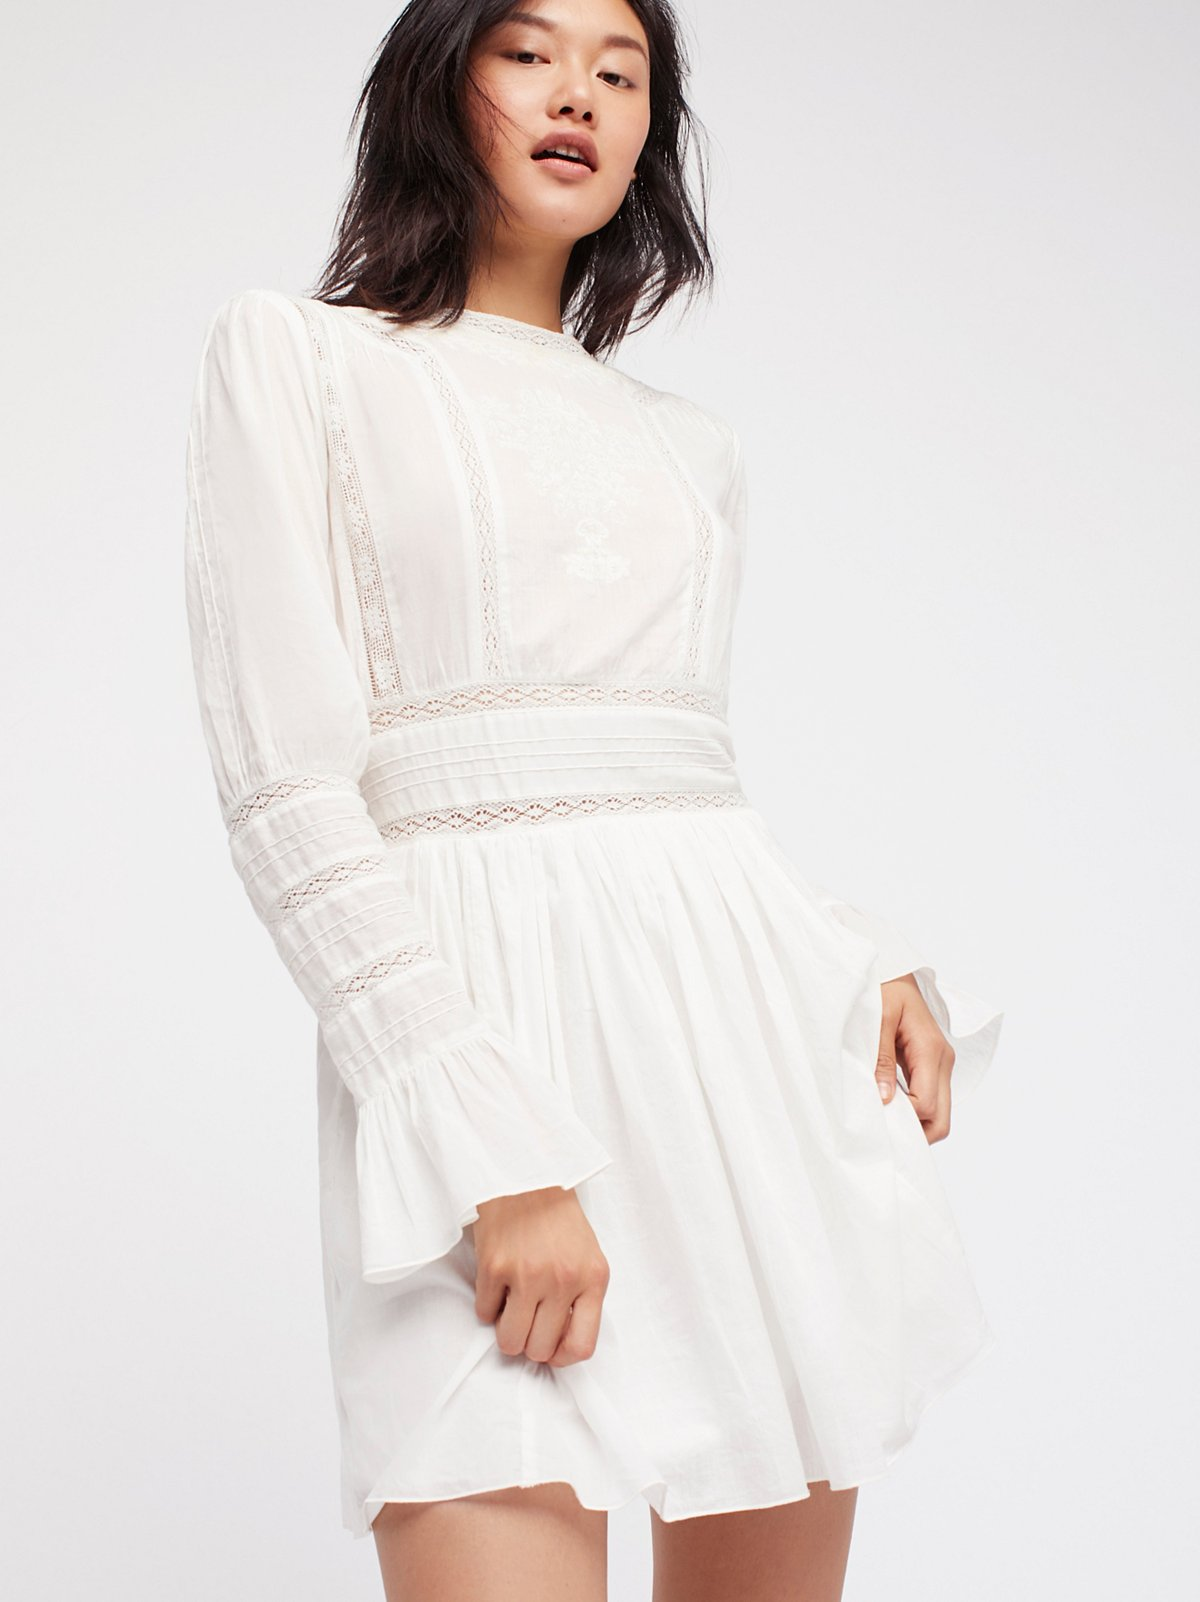 White Dresses Amp Little White Dresses Free People